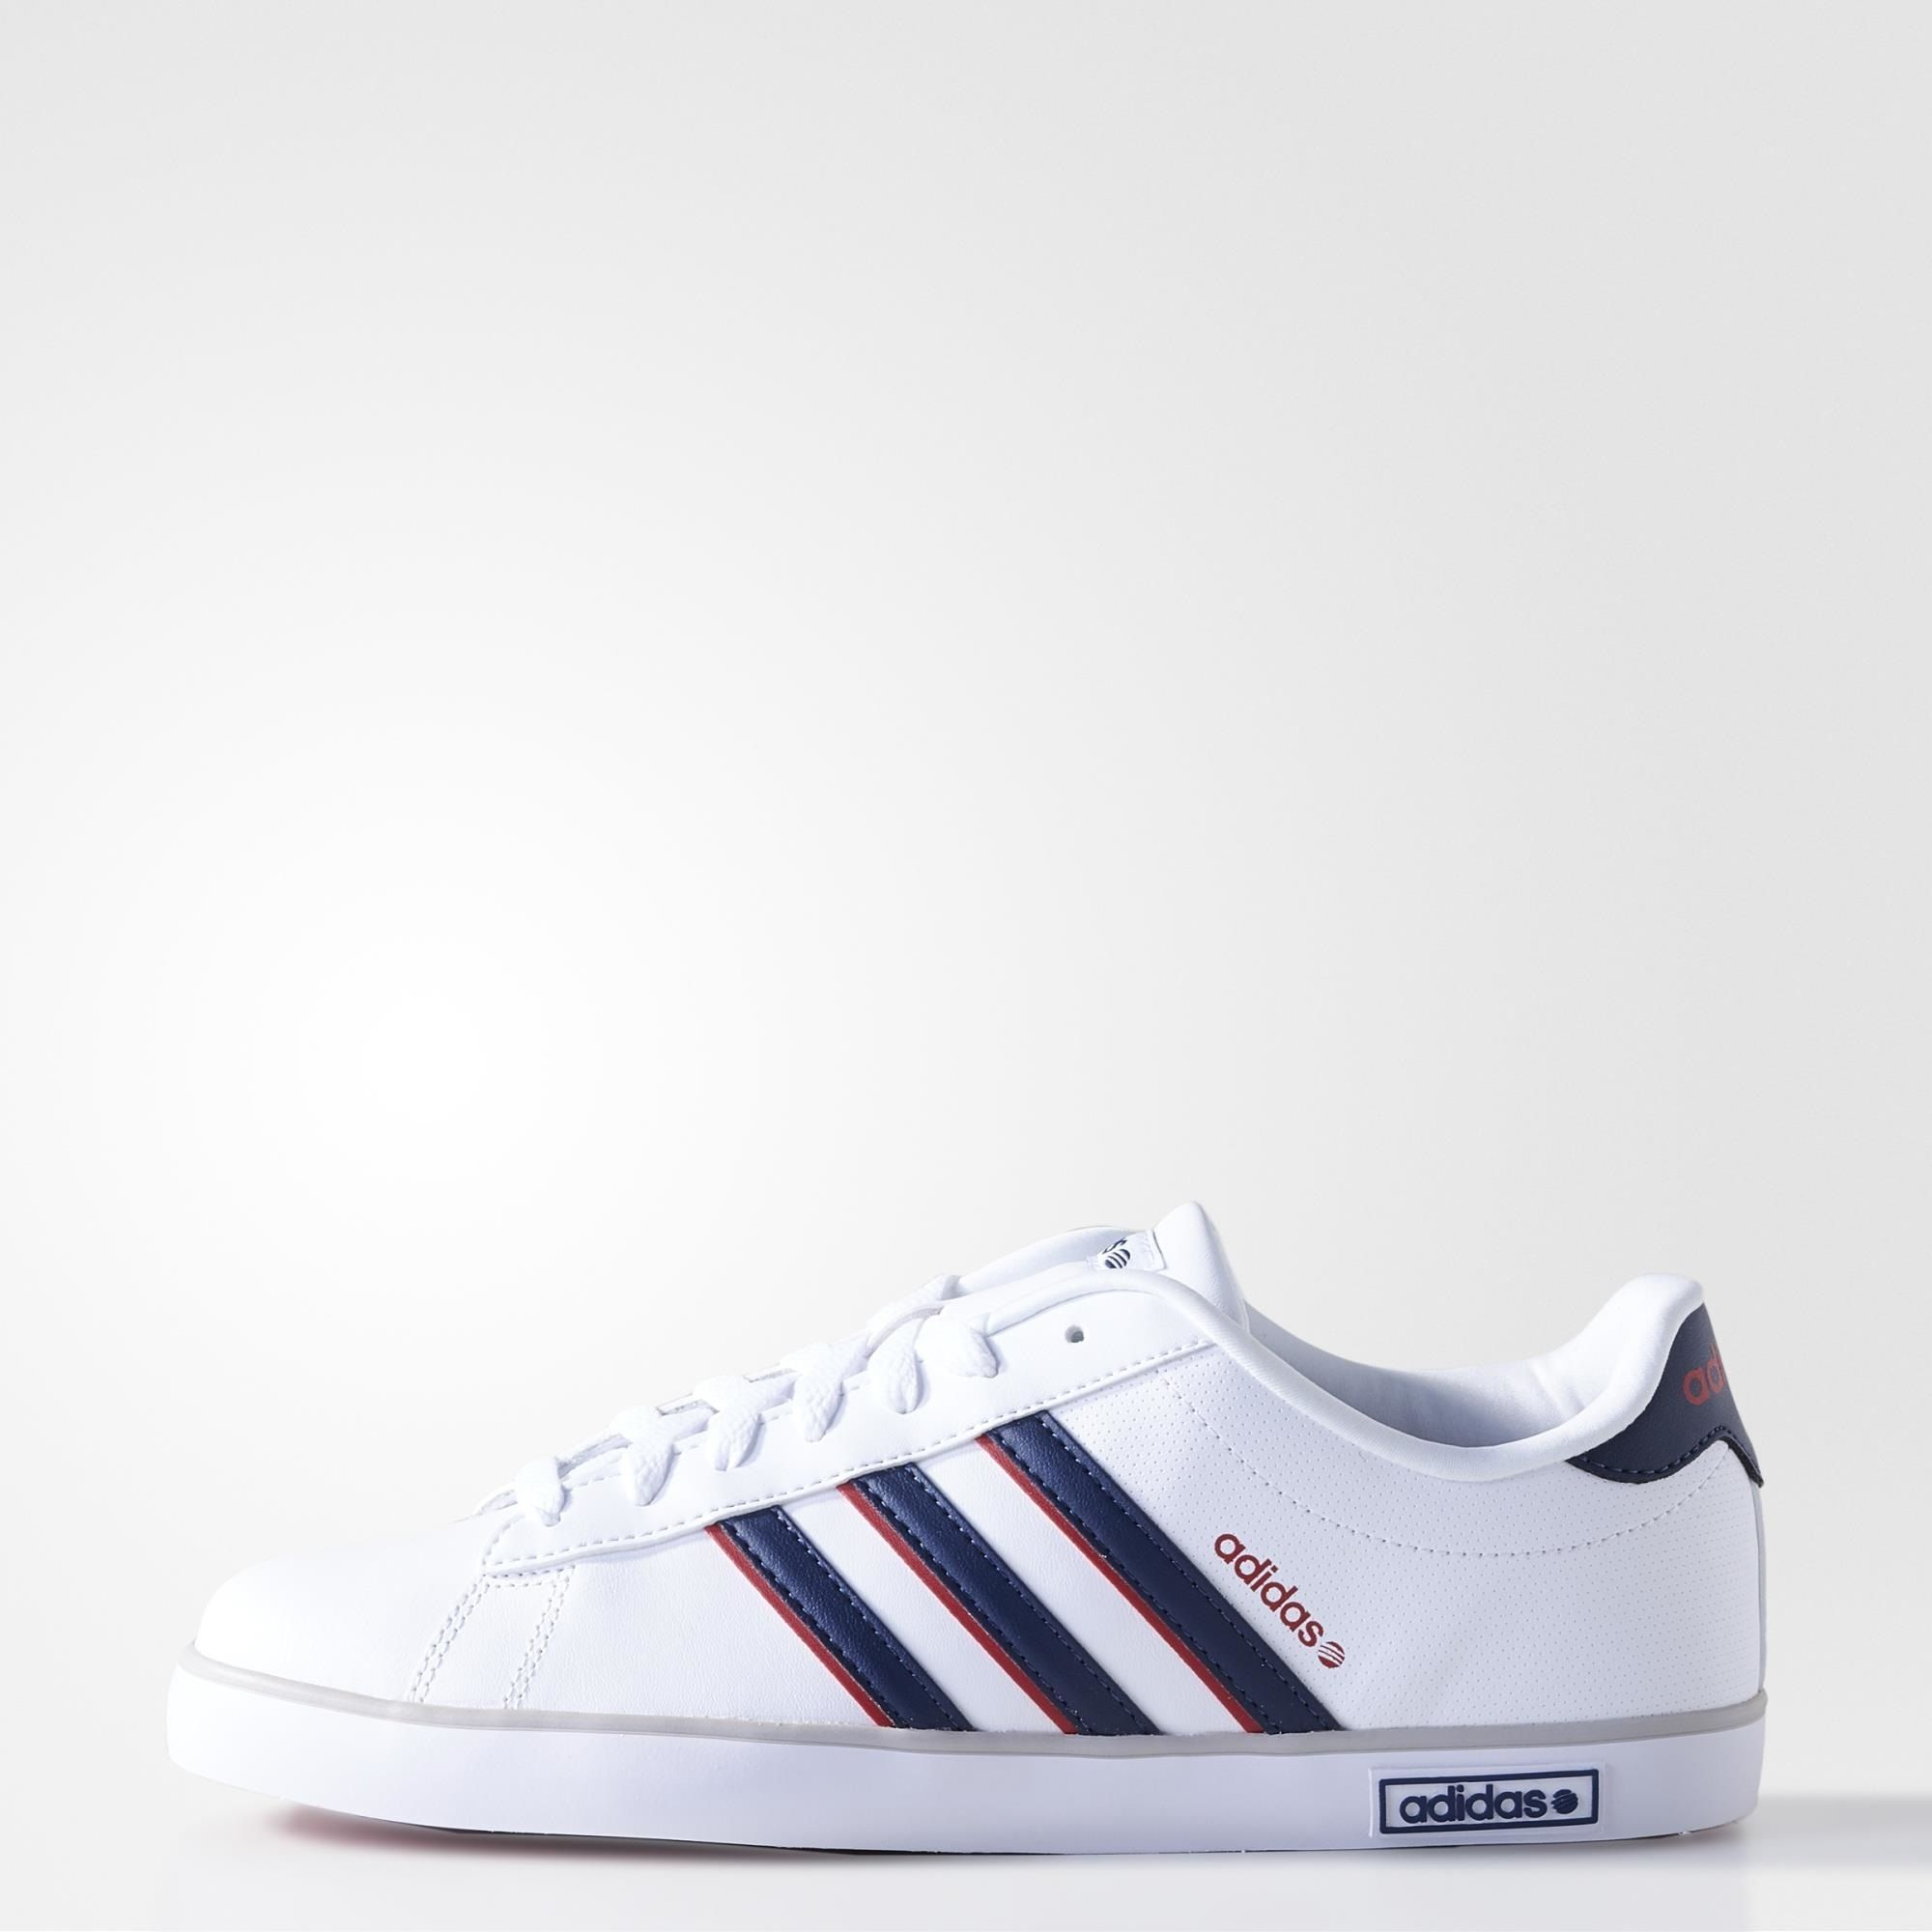 adidas copa white gold superstar